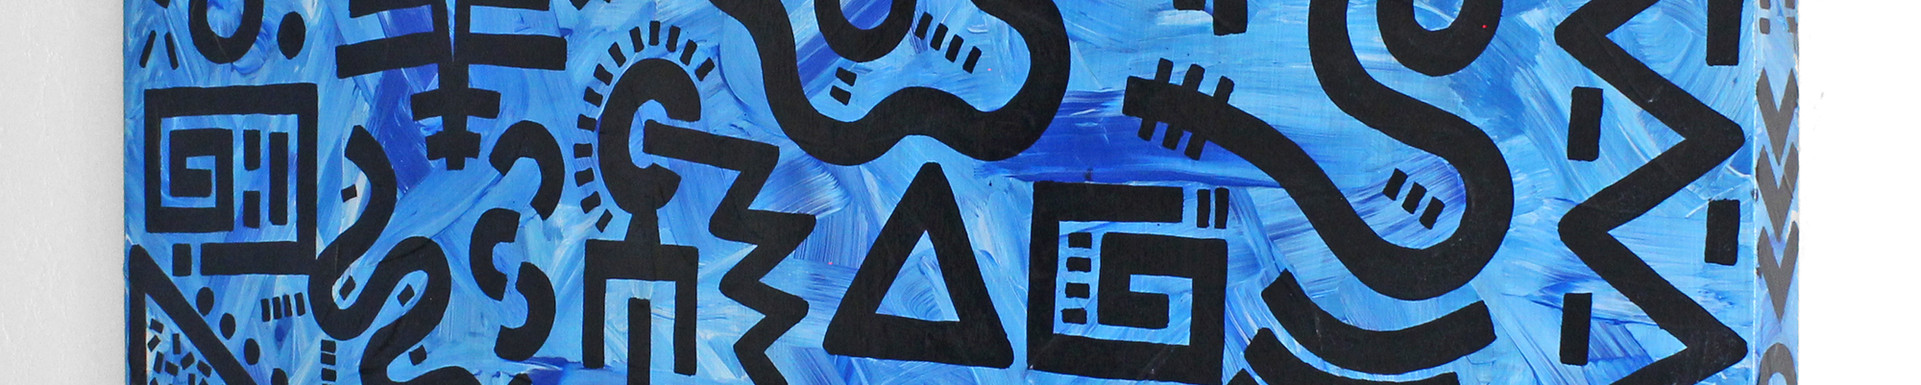 Blue Haring quarter.jpg